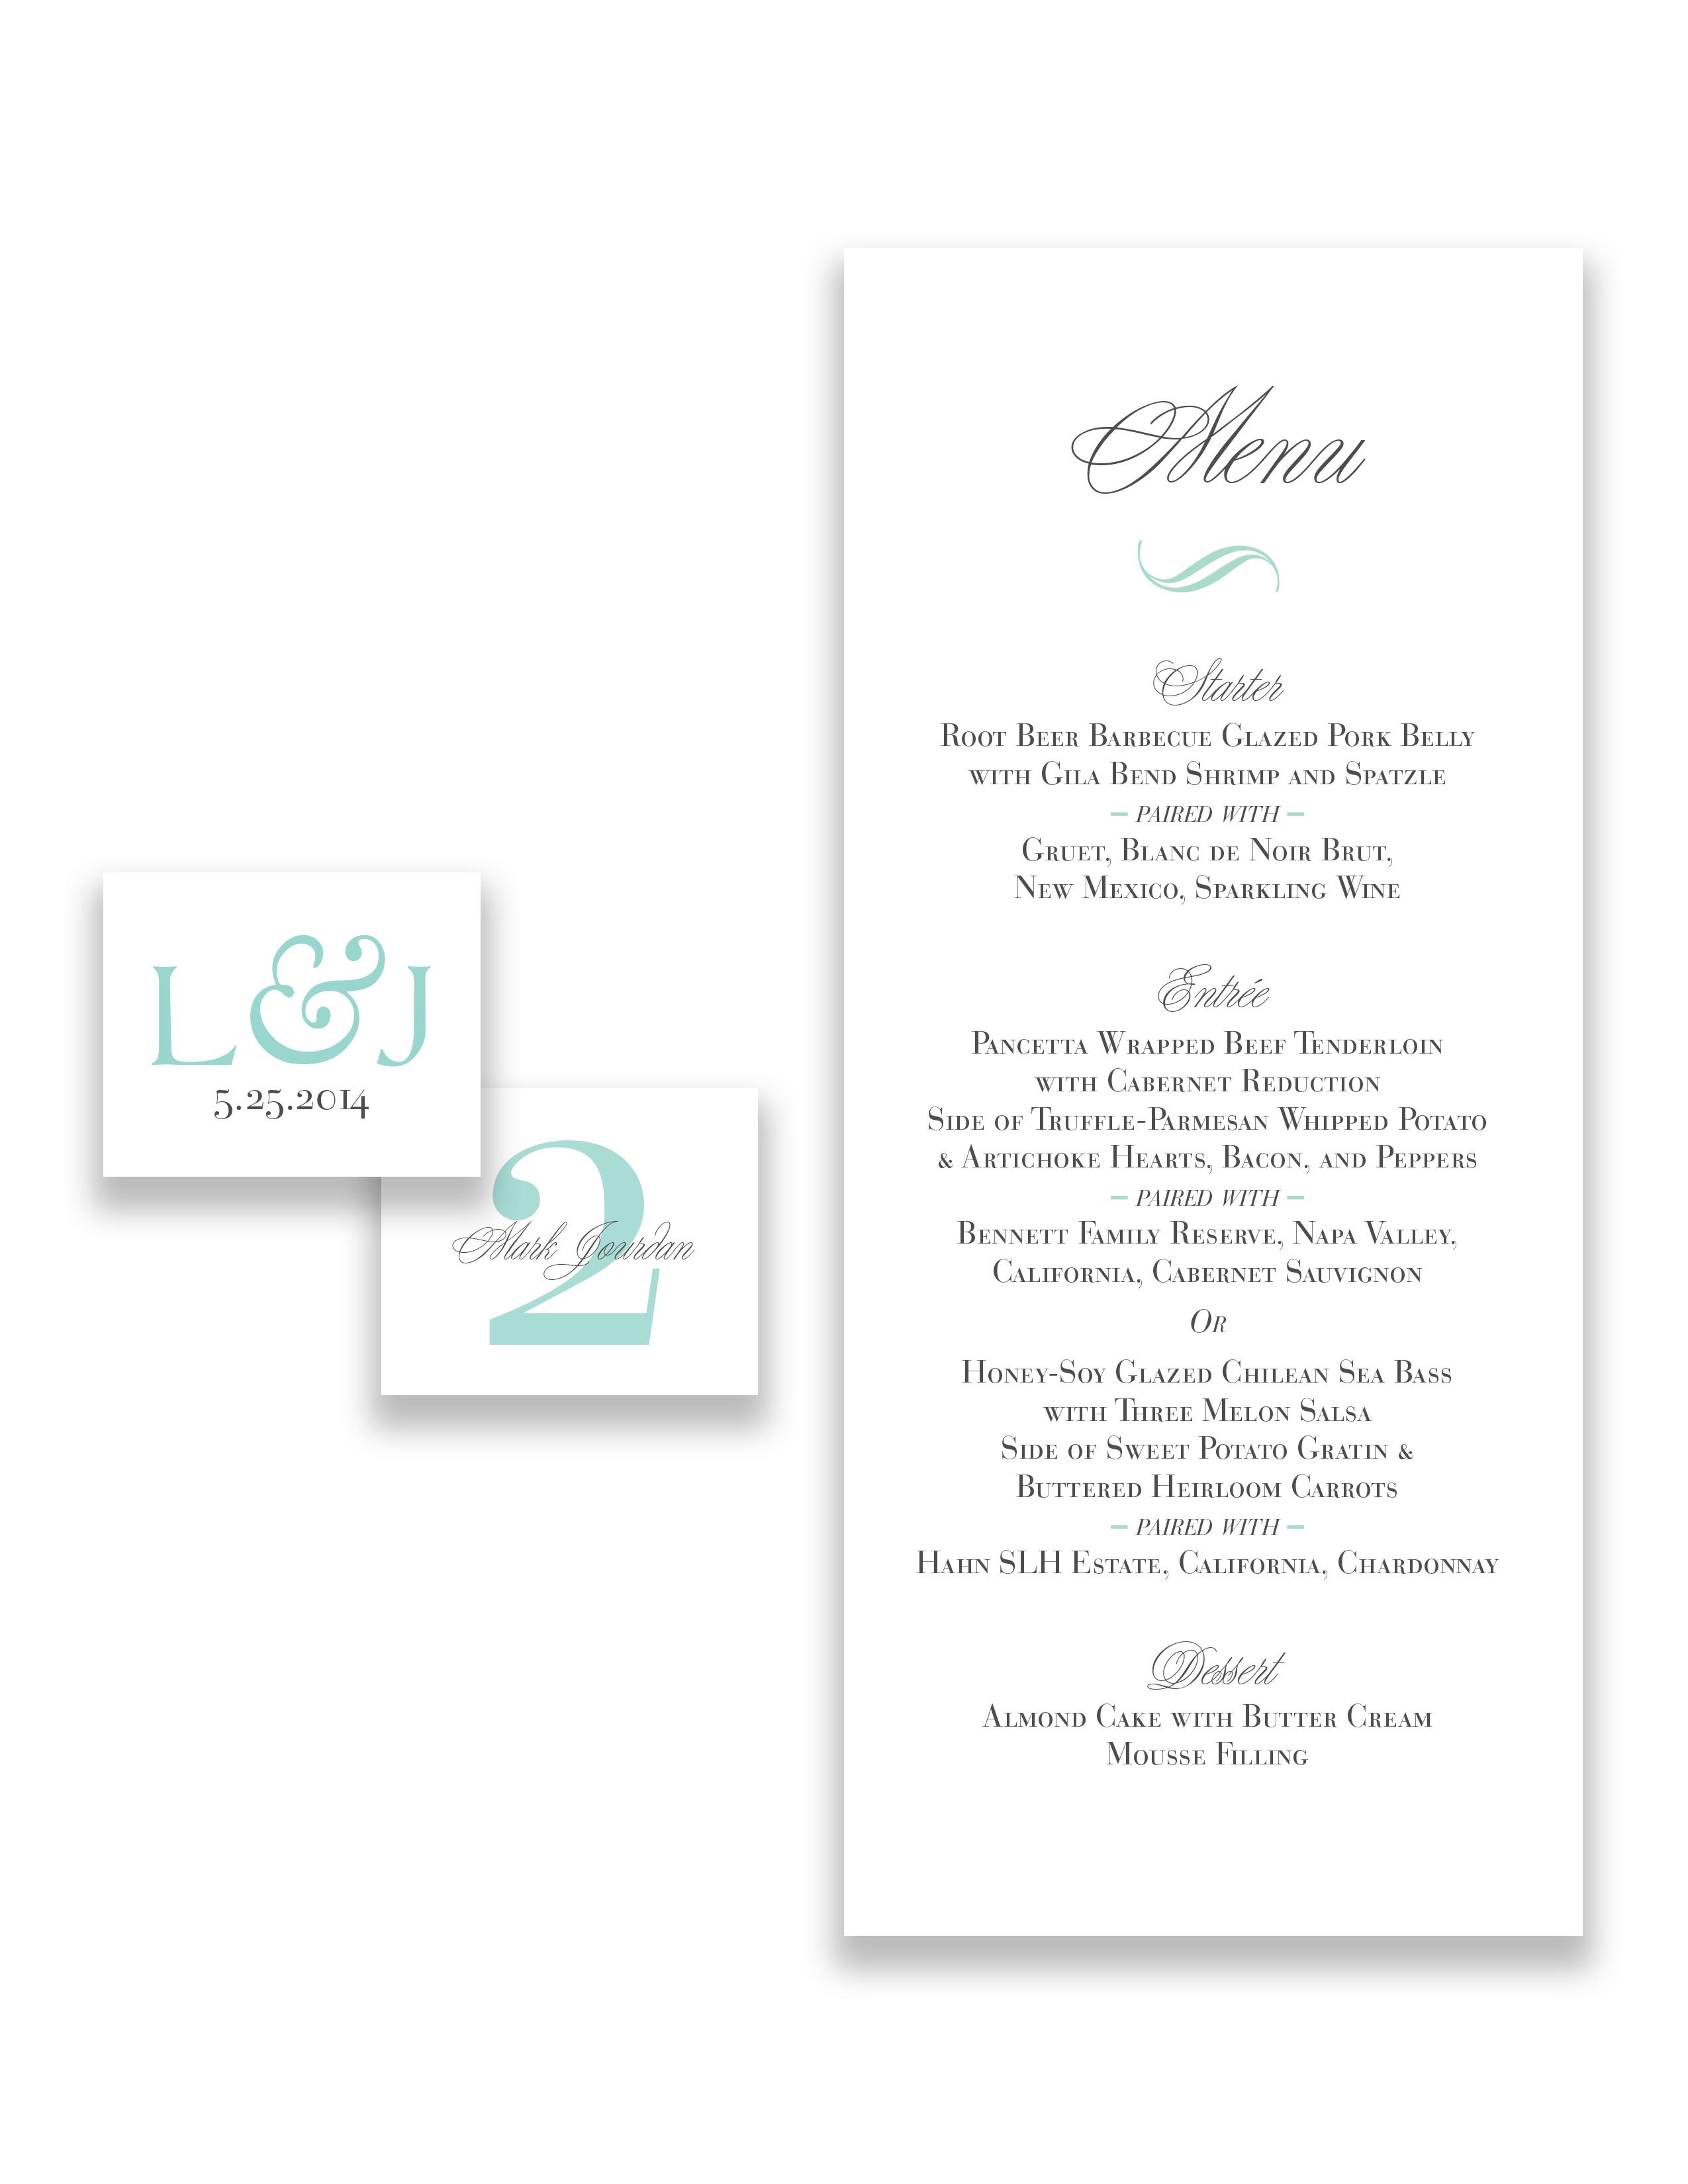 Christa Jourdan - Scottsdale Wedding